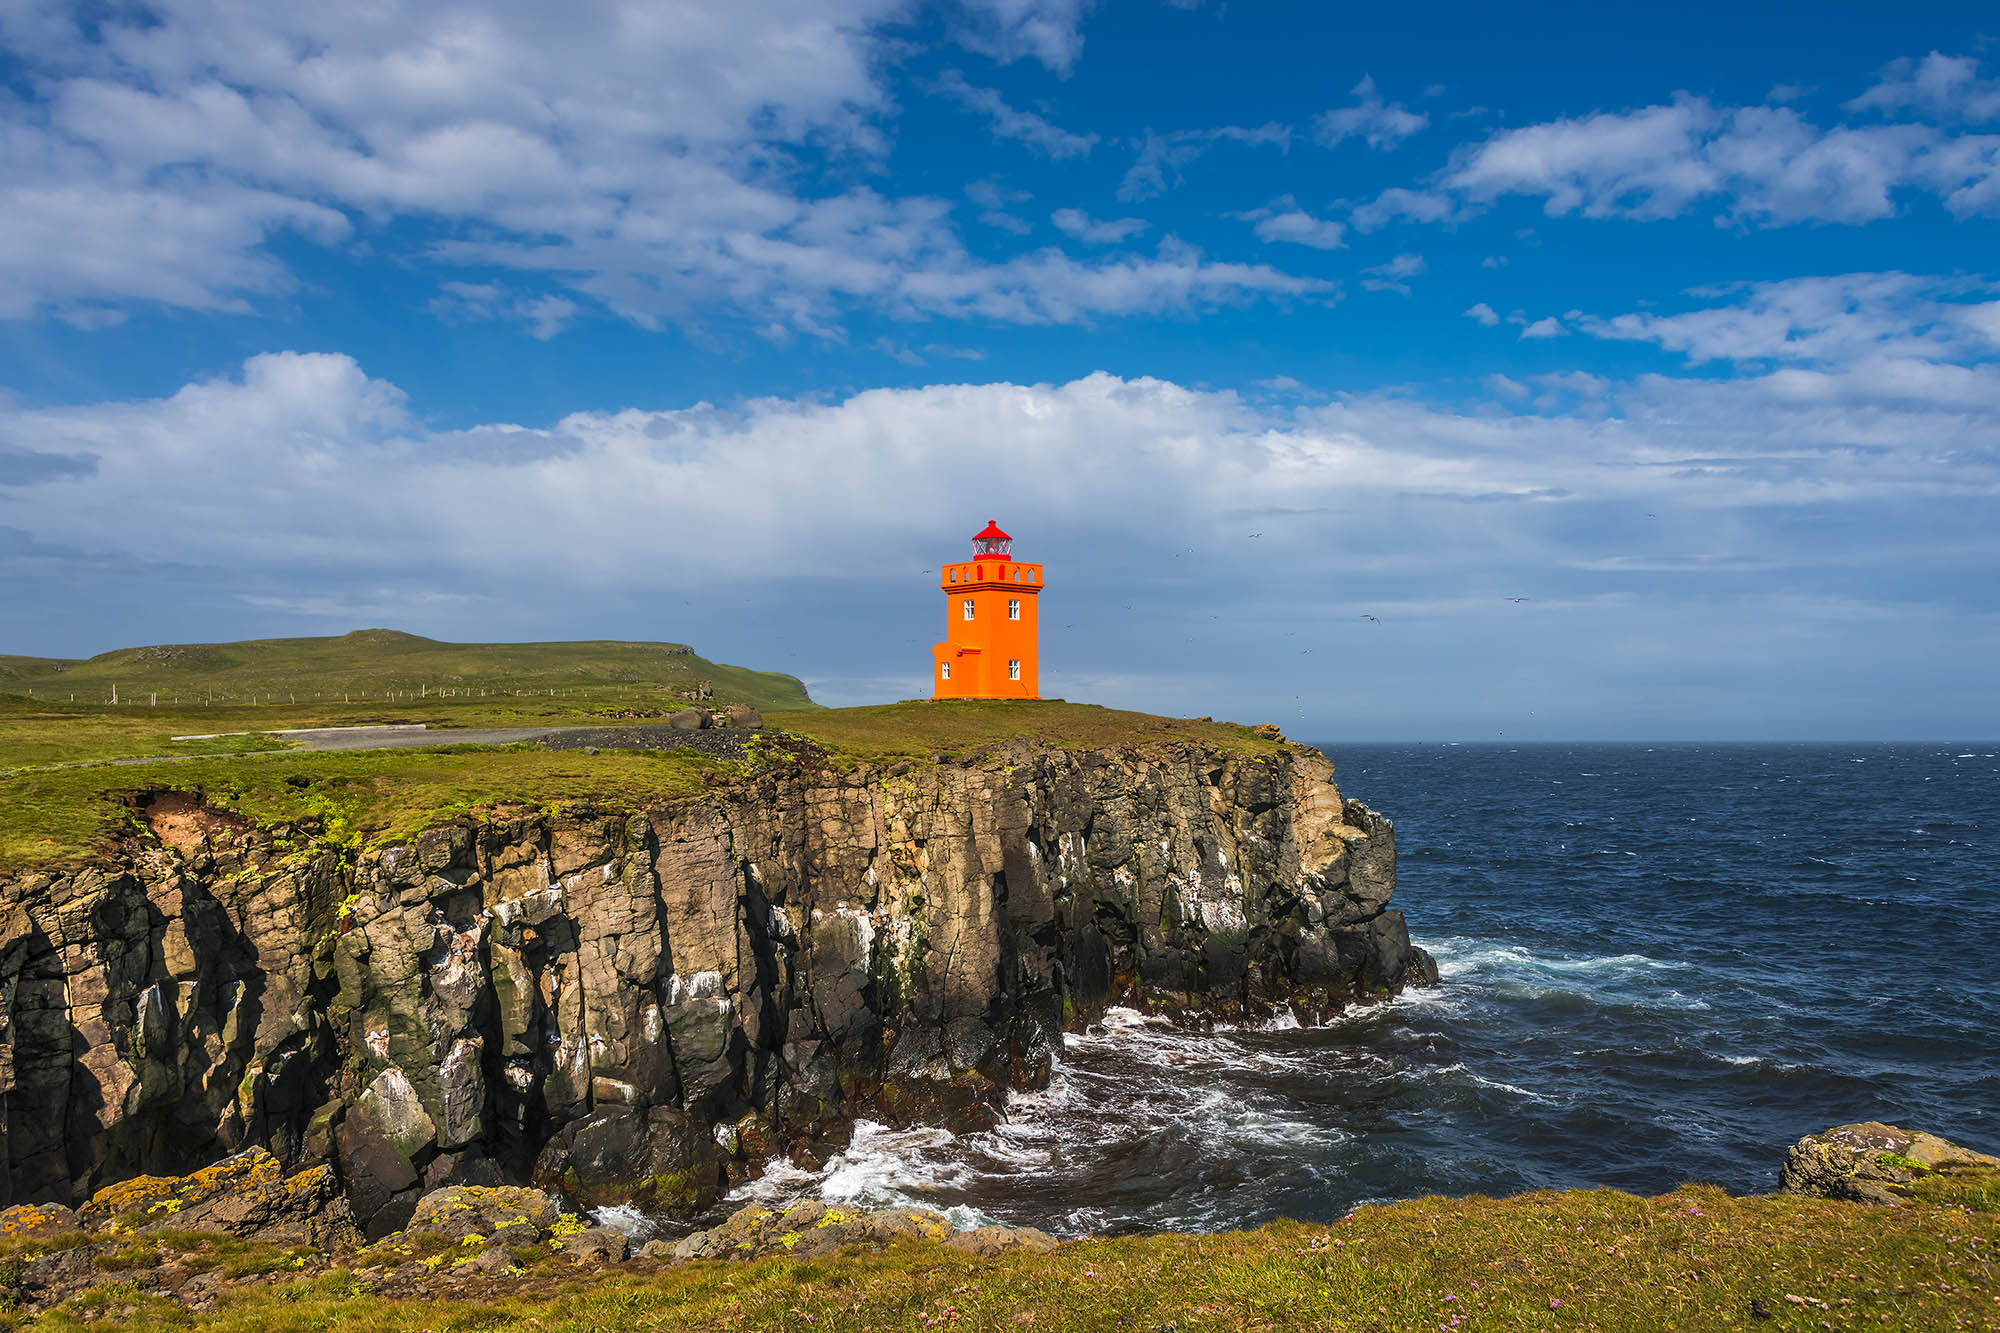 iceland grimsey island tour